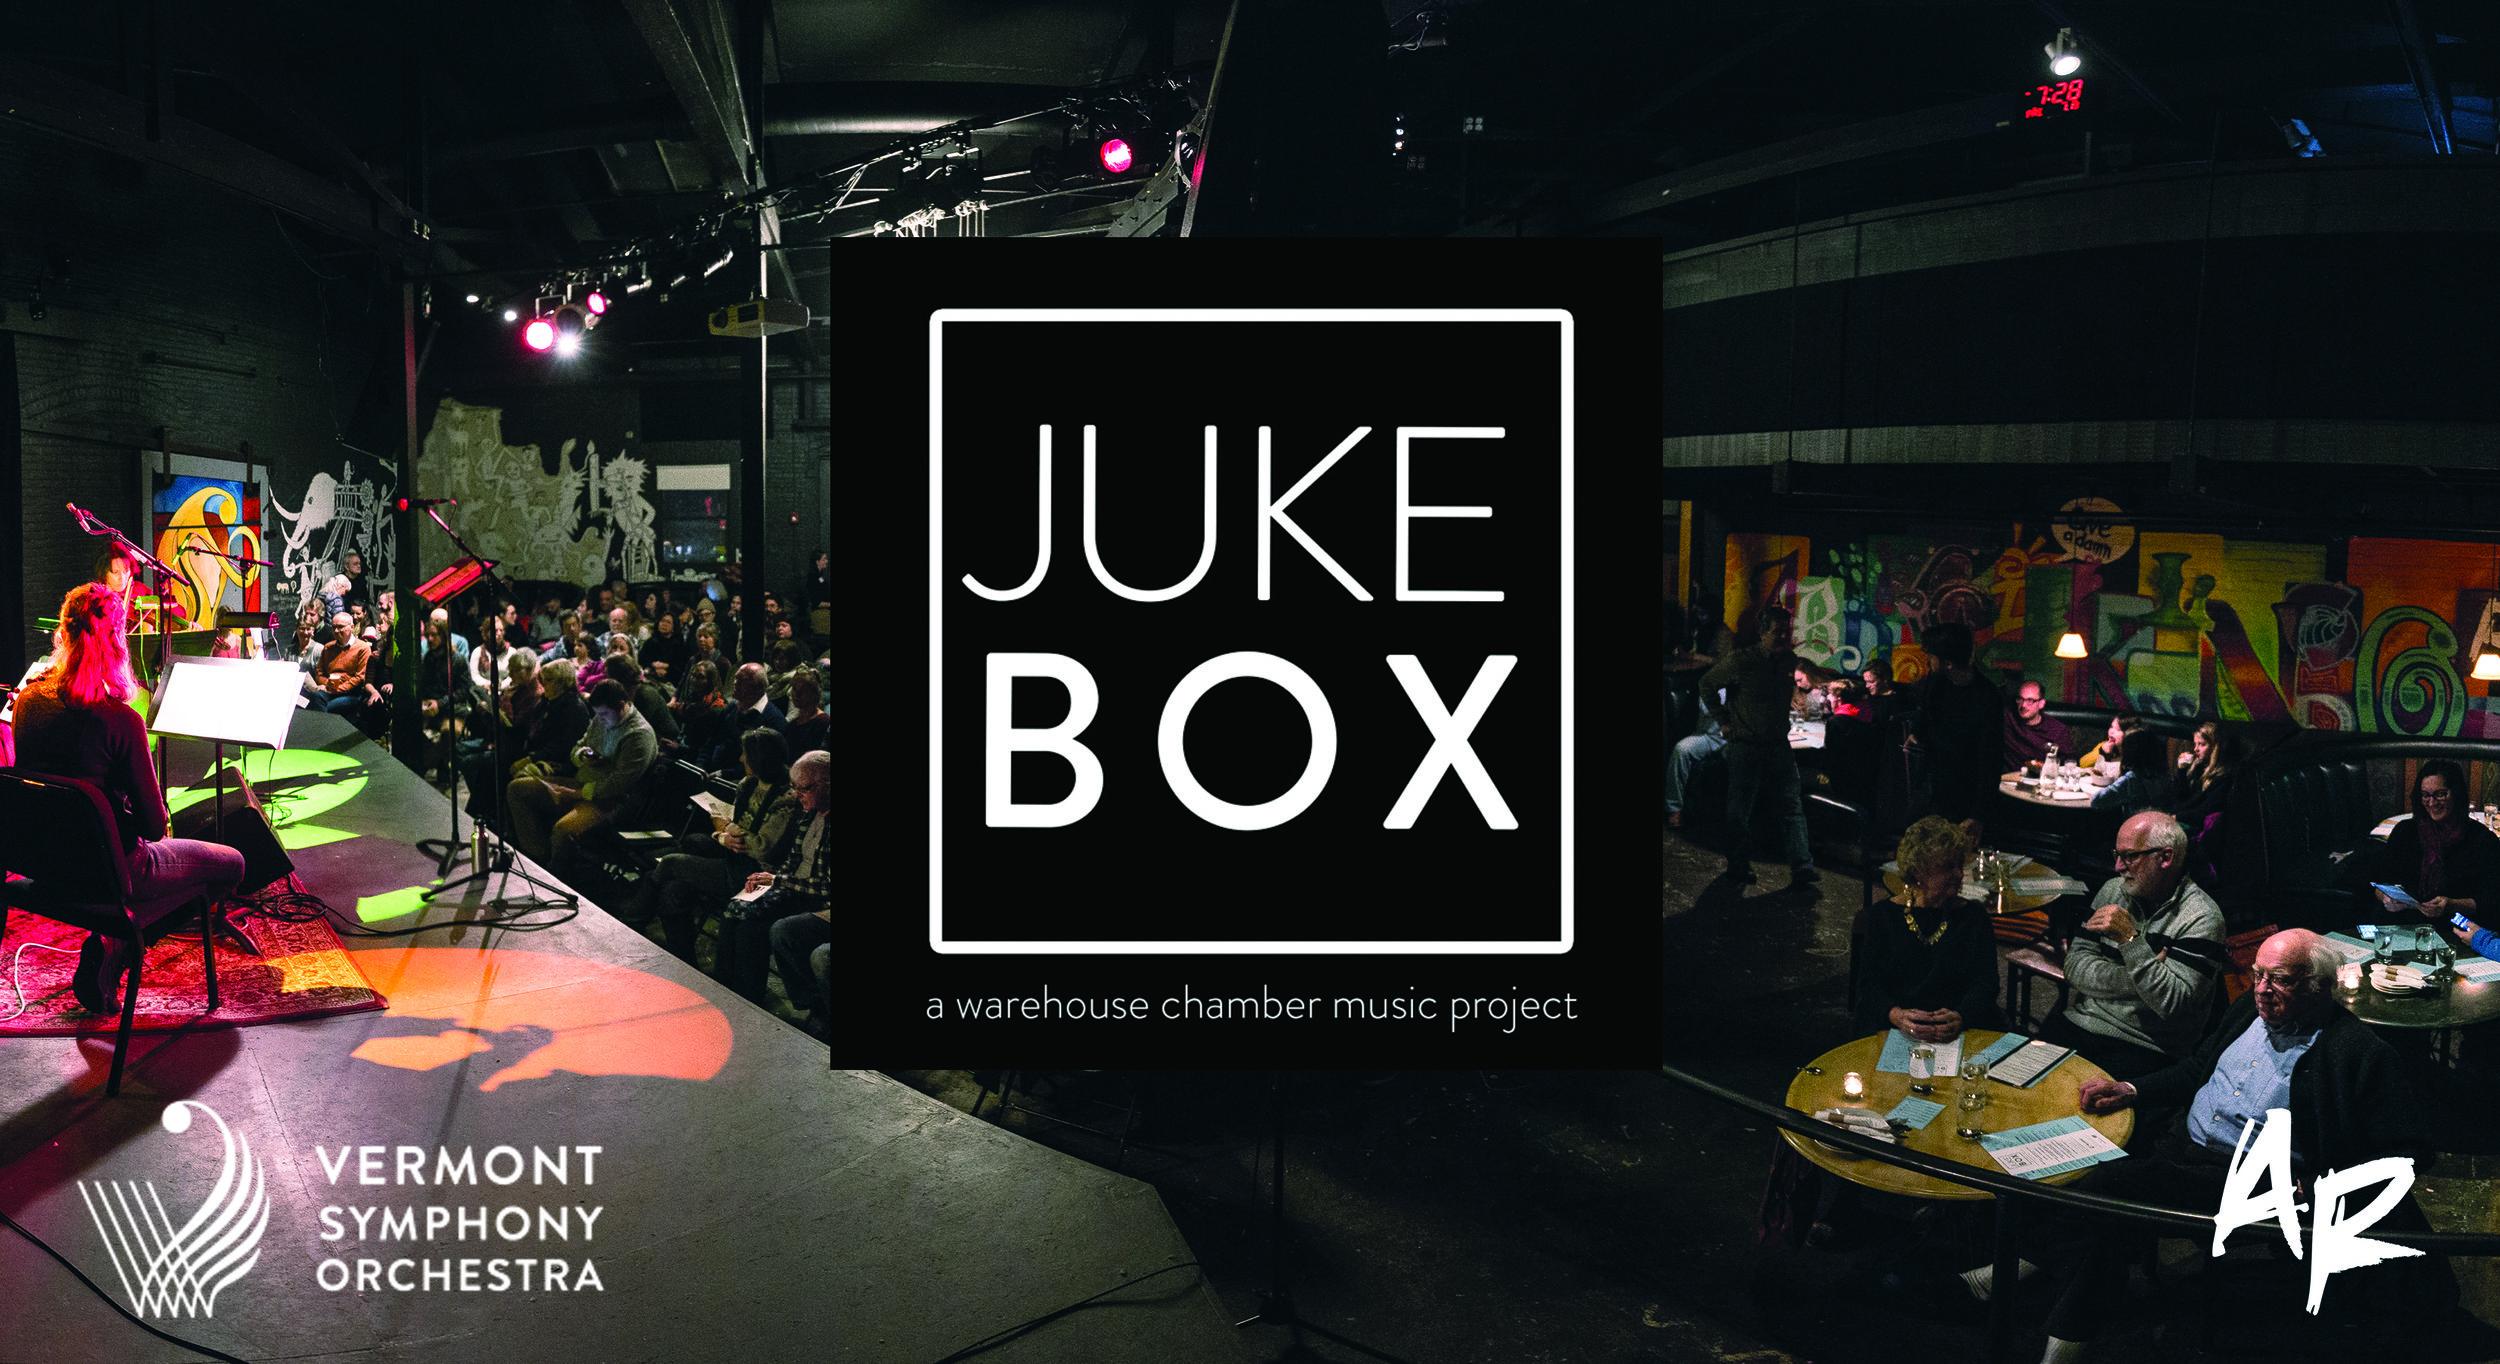 jukebox_banner.jpg